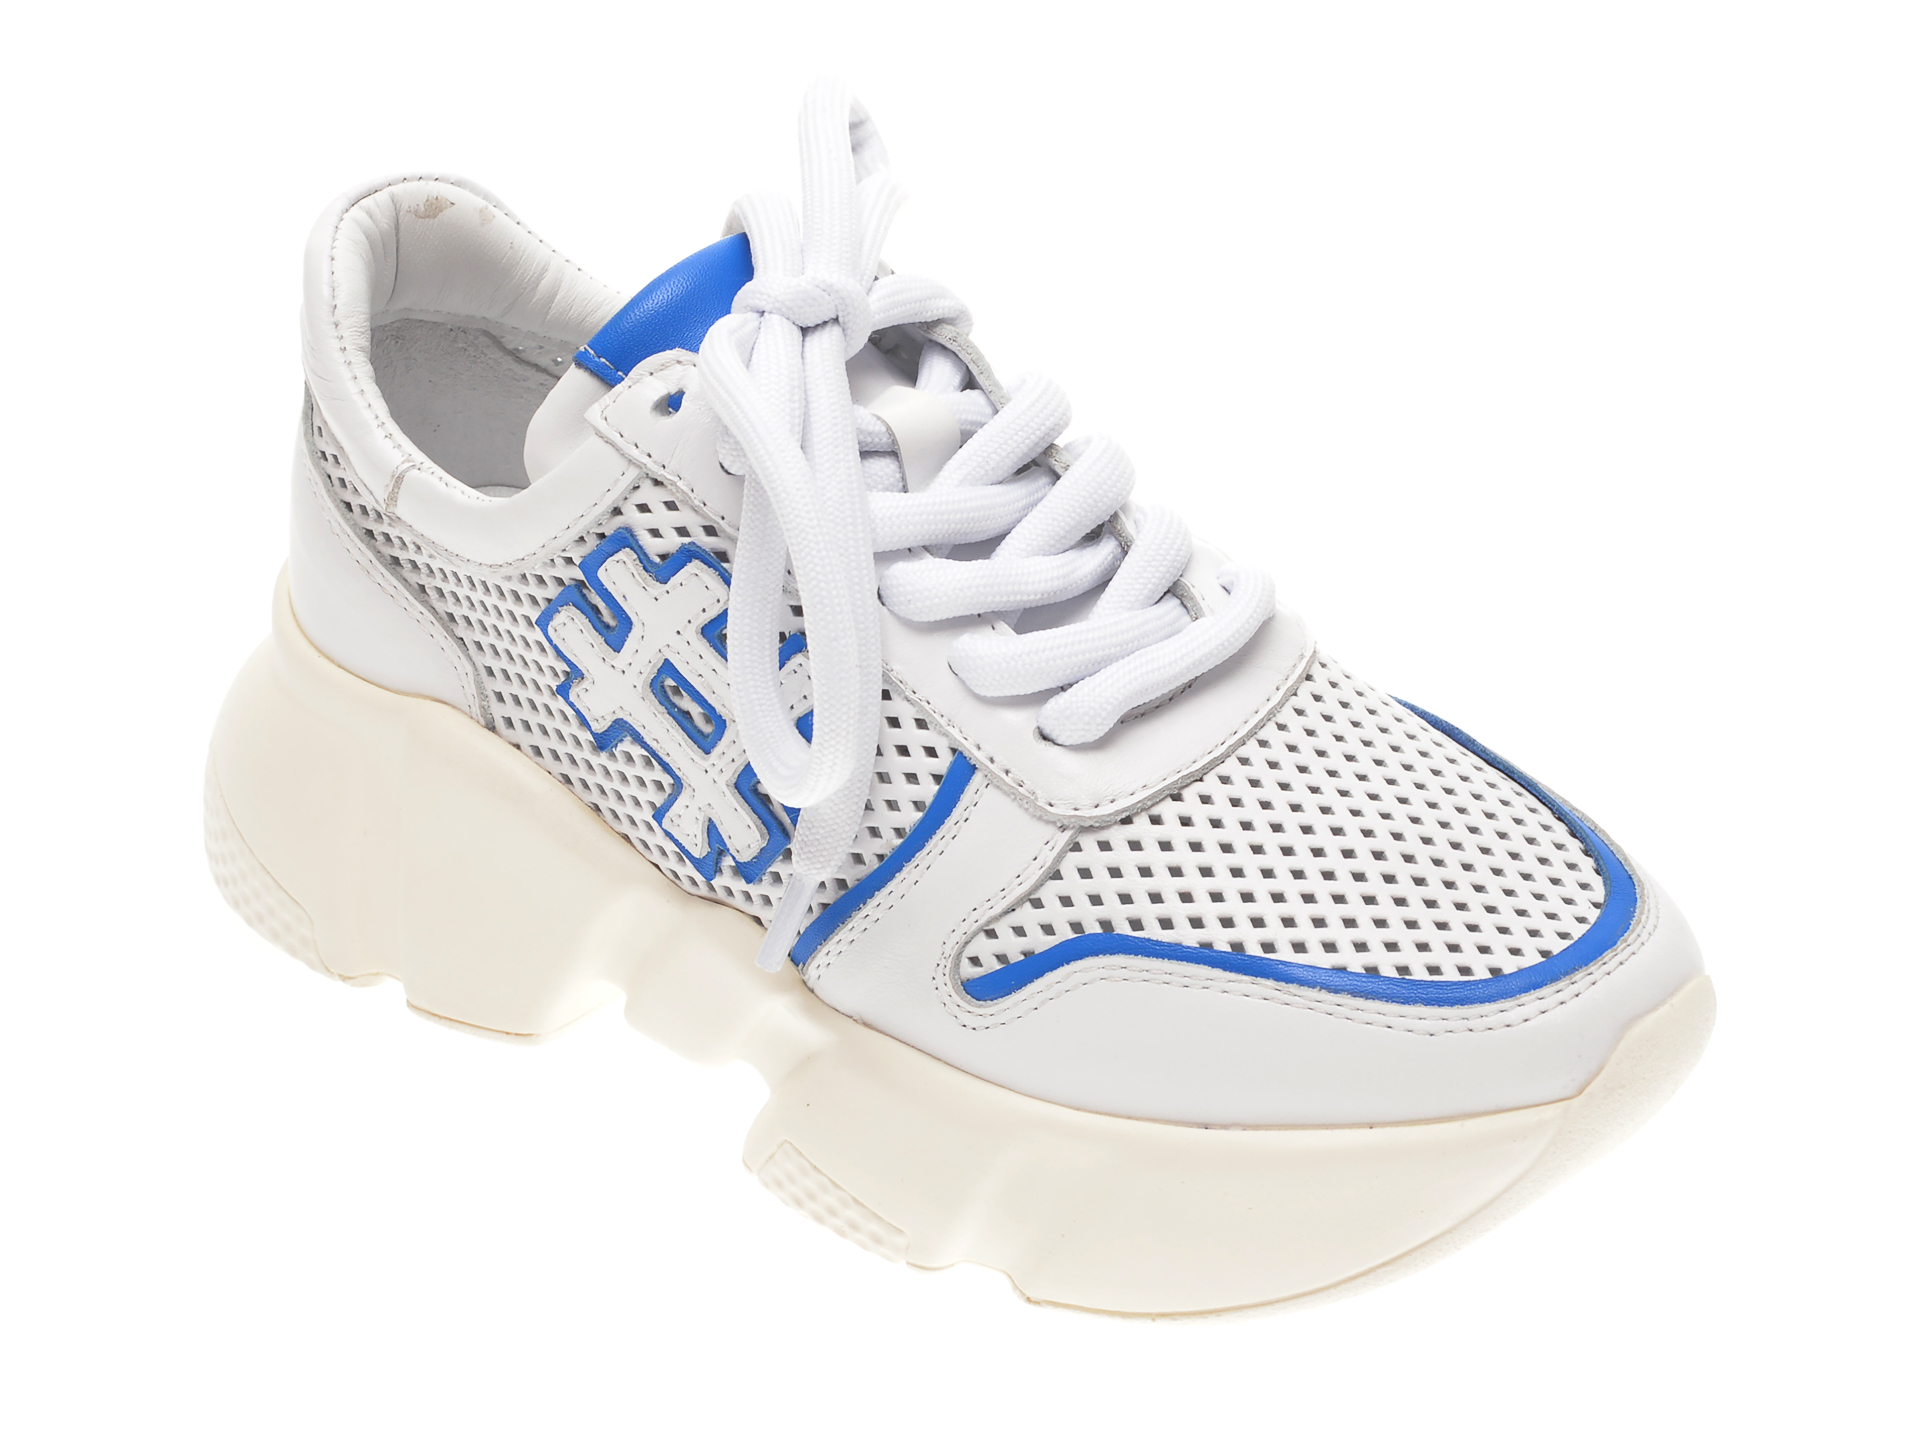 Pantofi Sport Flavia Passini Albi, 135p49, Din Piele Naturala